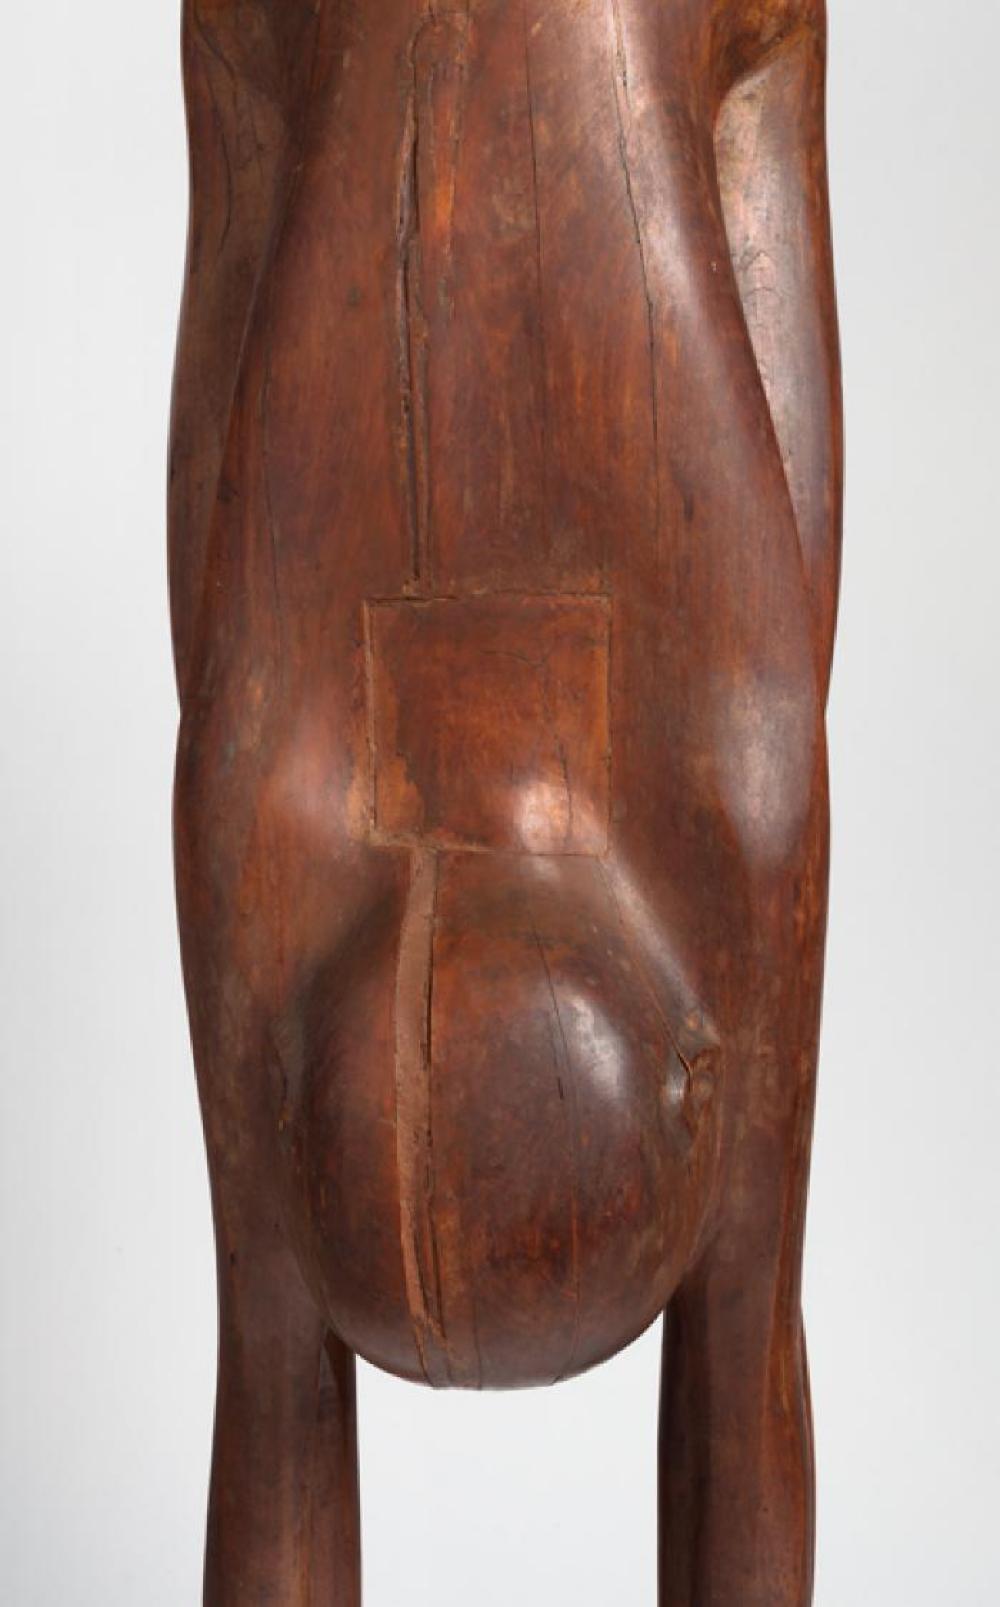 Boy Looking through Legs, image 9